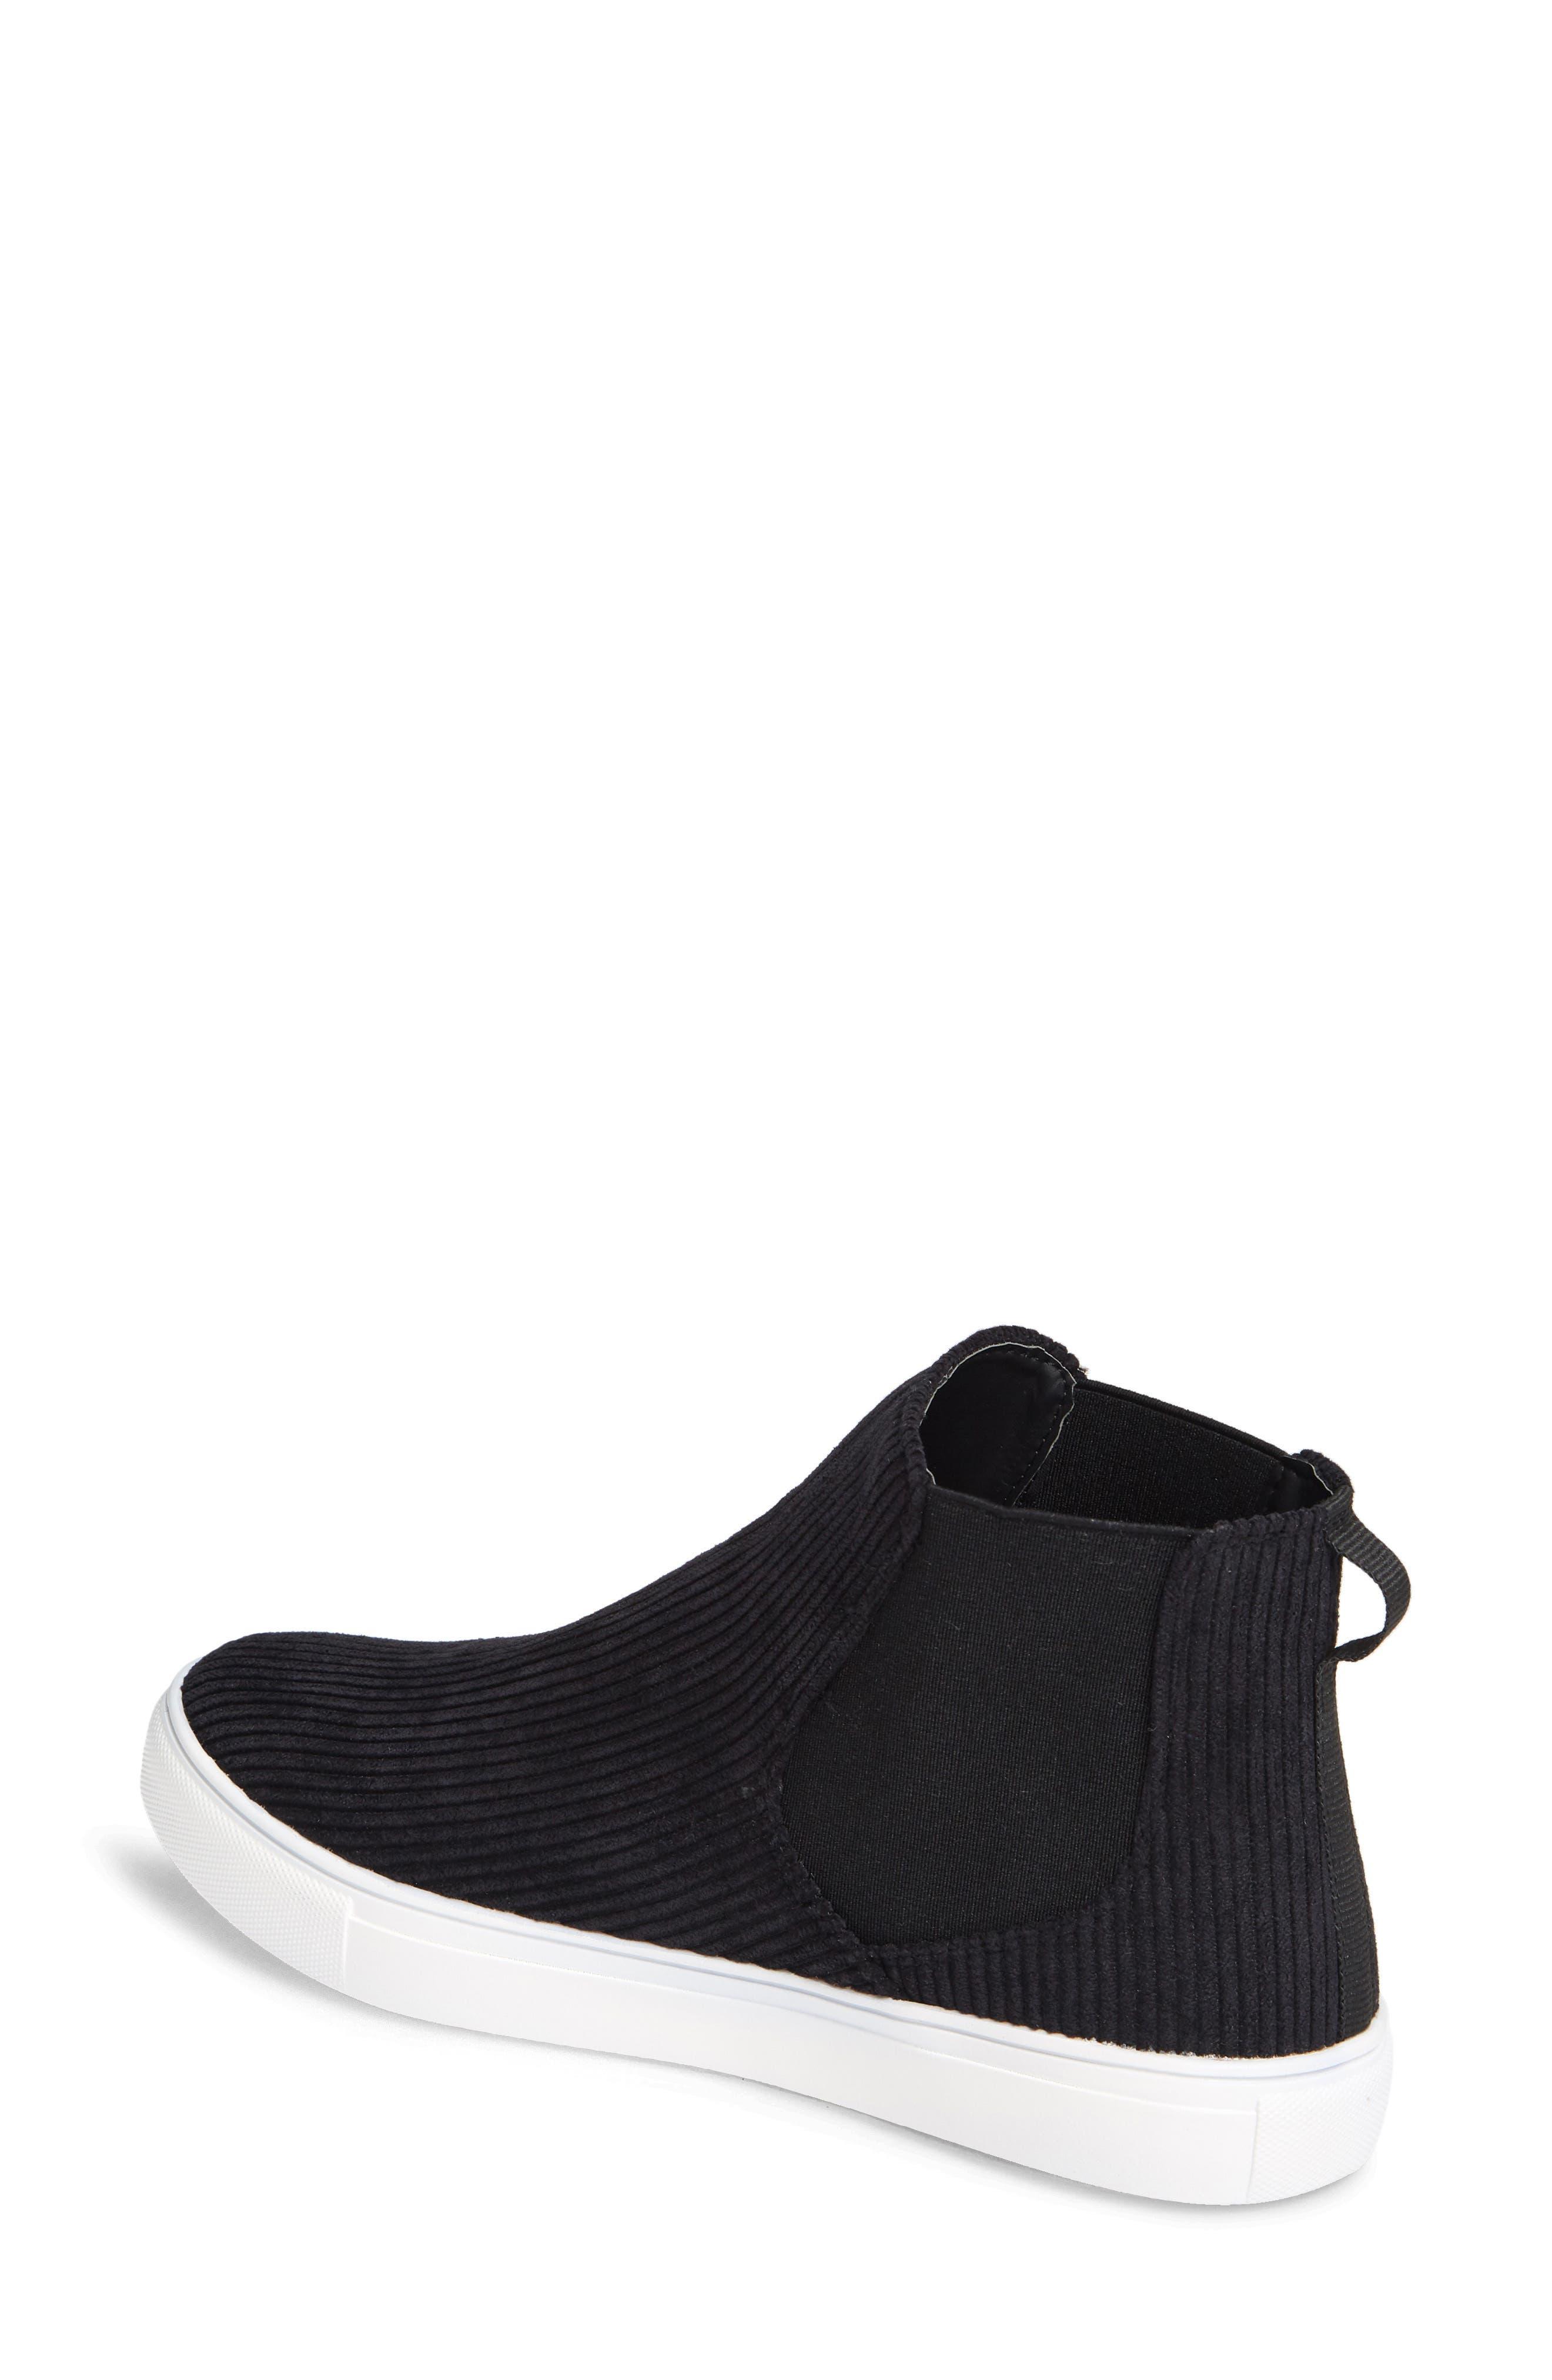 Stratford High Top Sneaker,                             Alternate thumbnail 2, color,                             BLACK FABRIC